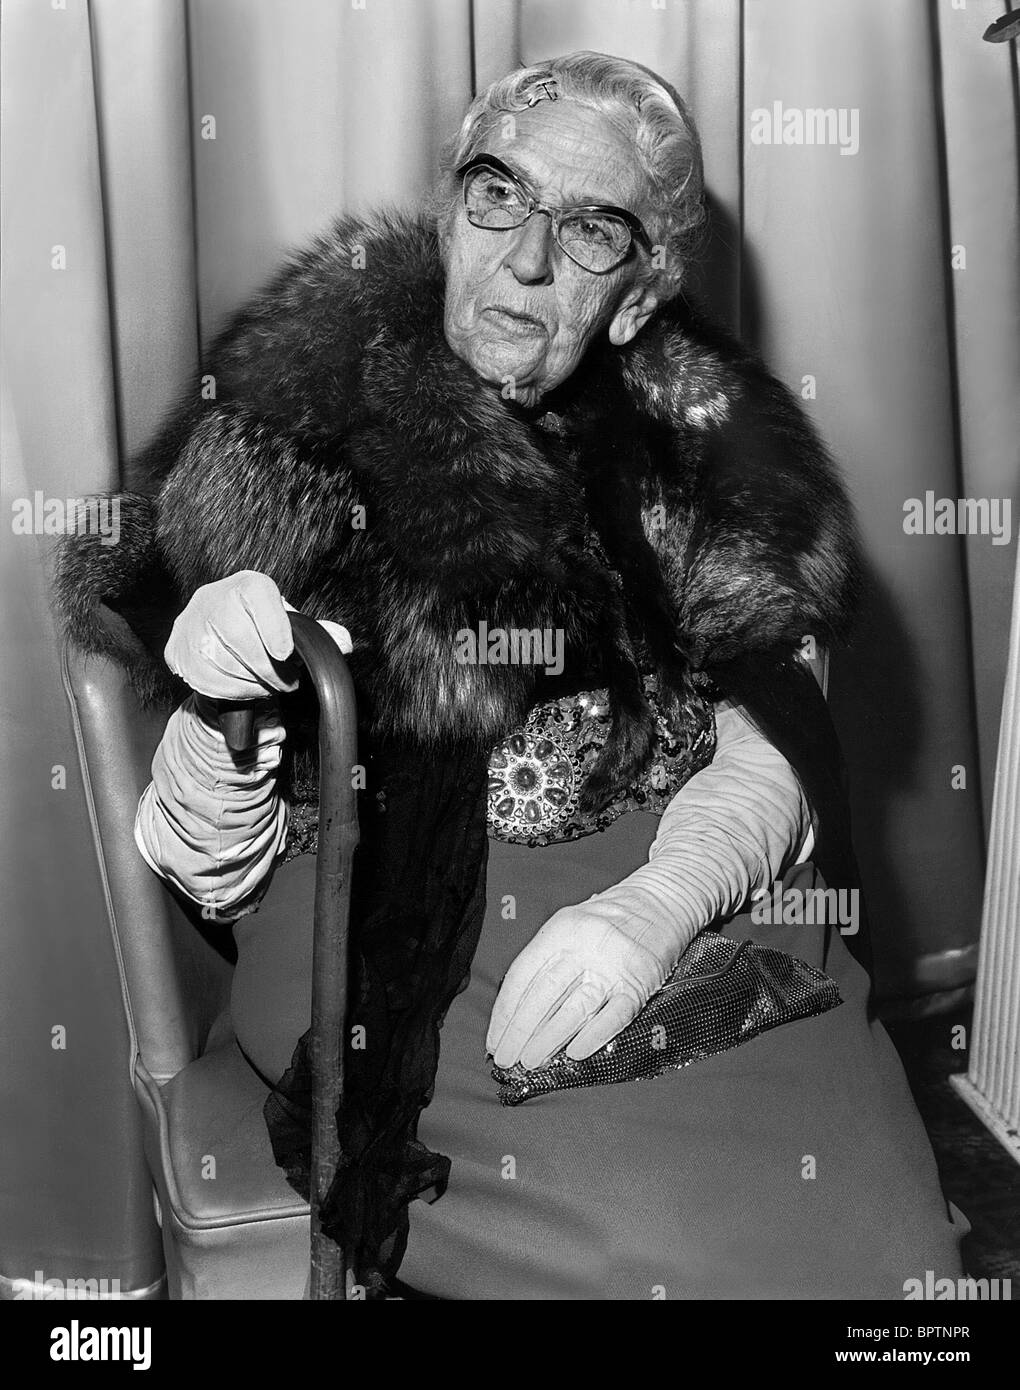 AGATHA CHRISTIE WRITER MURDER MYSTERY NOVELS (1972) - Stock Image